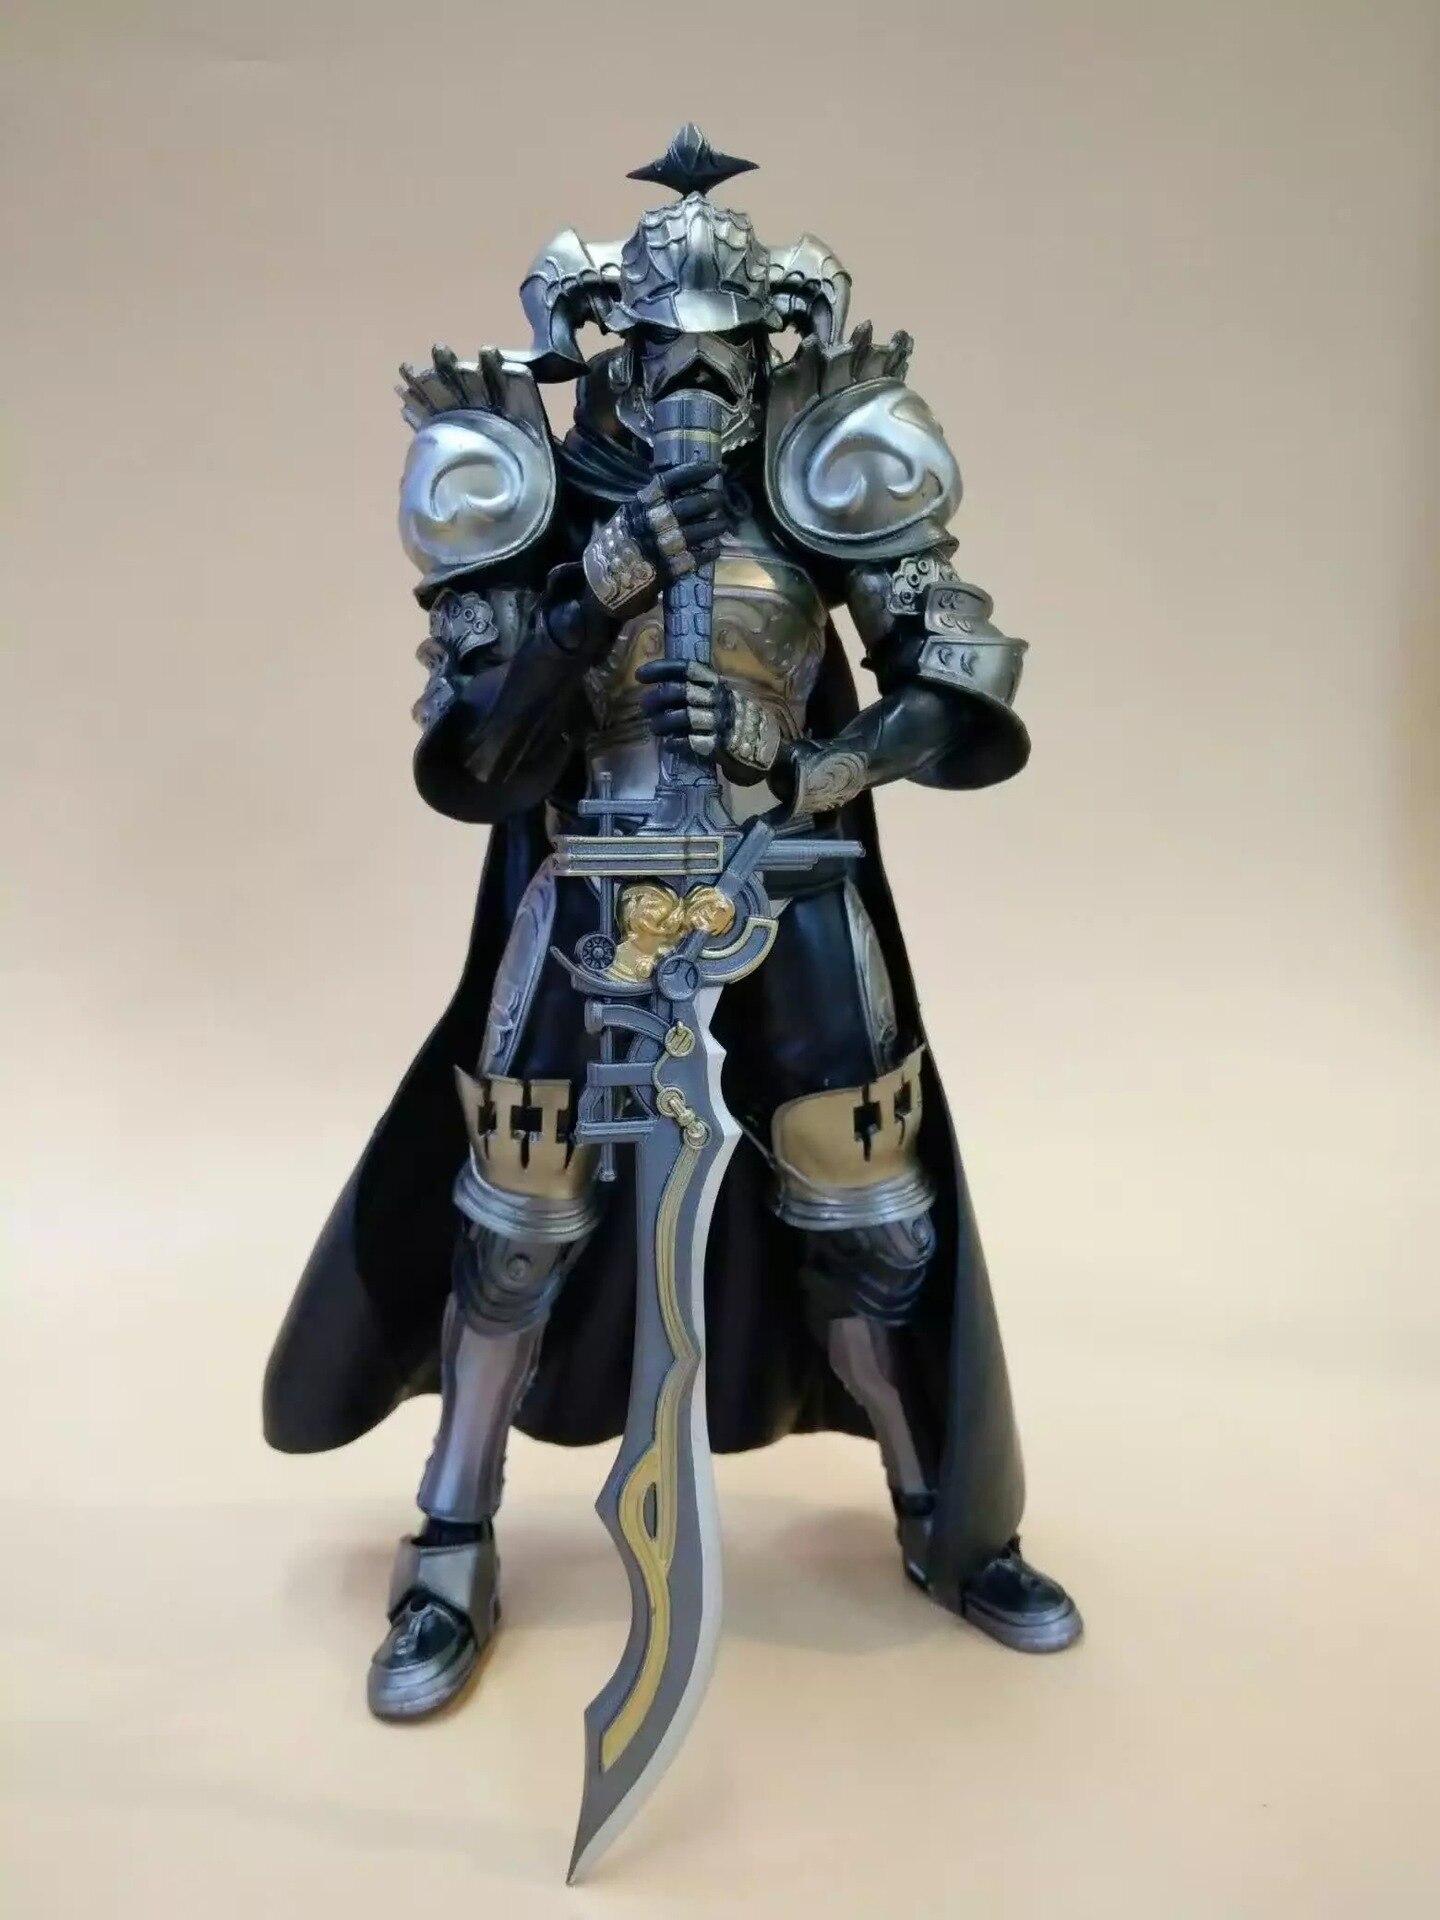 ФОТО Final fantasy 12 judge ng blas hand model,Children model toys,Robot. Children gifts, Christmas gifts